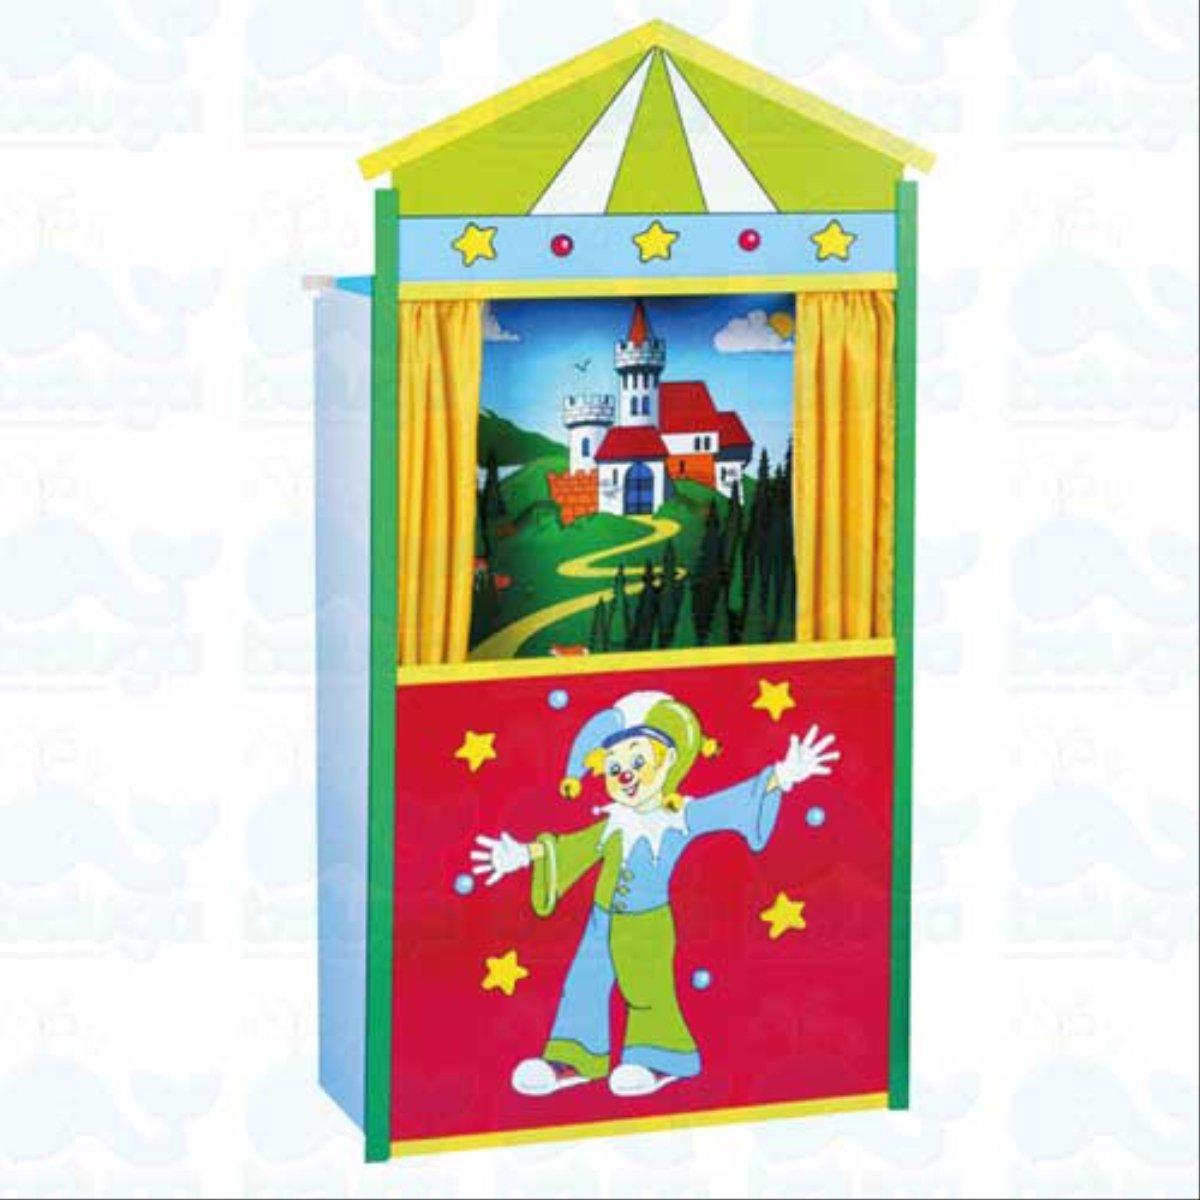 Beluga Toys Theatre 50128Puppets Doll Beluga Spielwaren GmbH